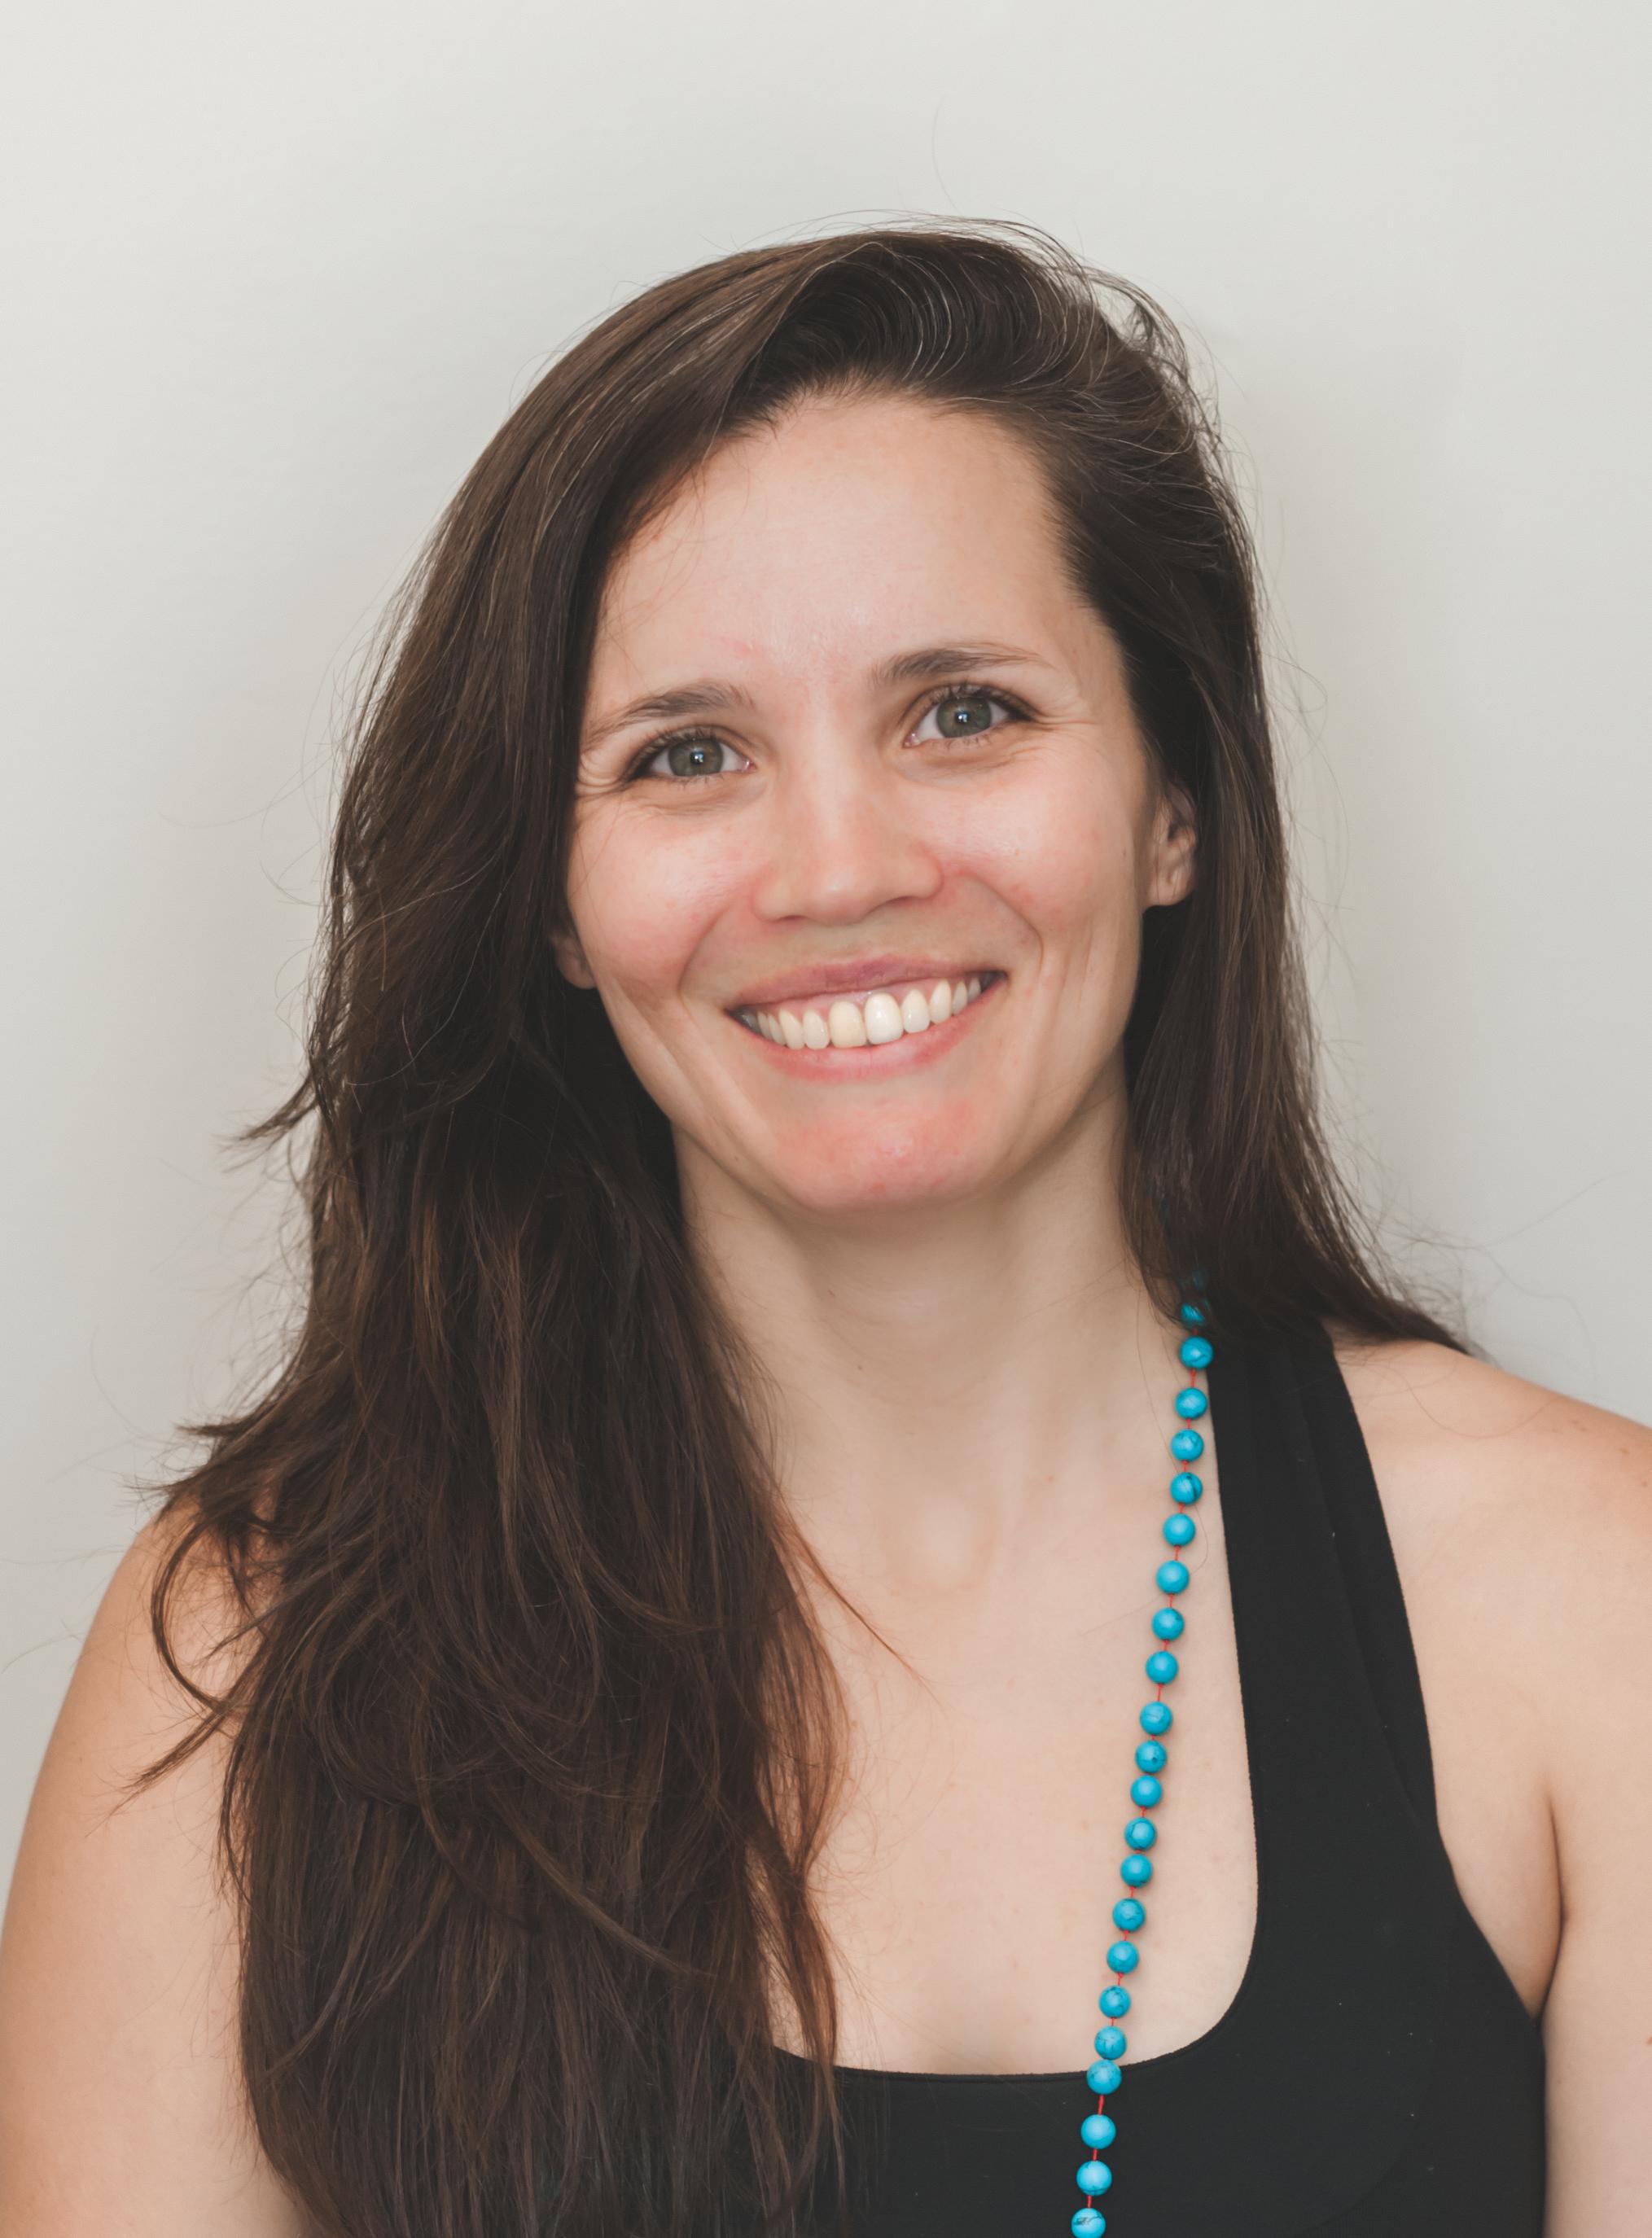 Sarah McConkie